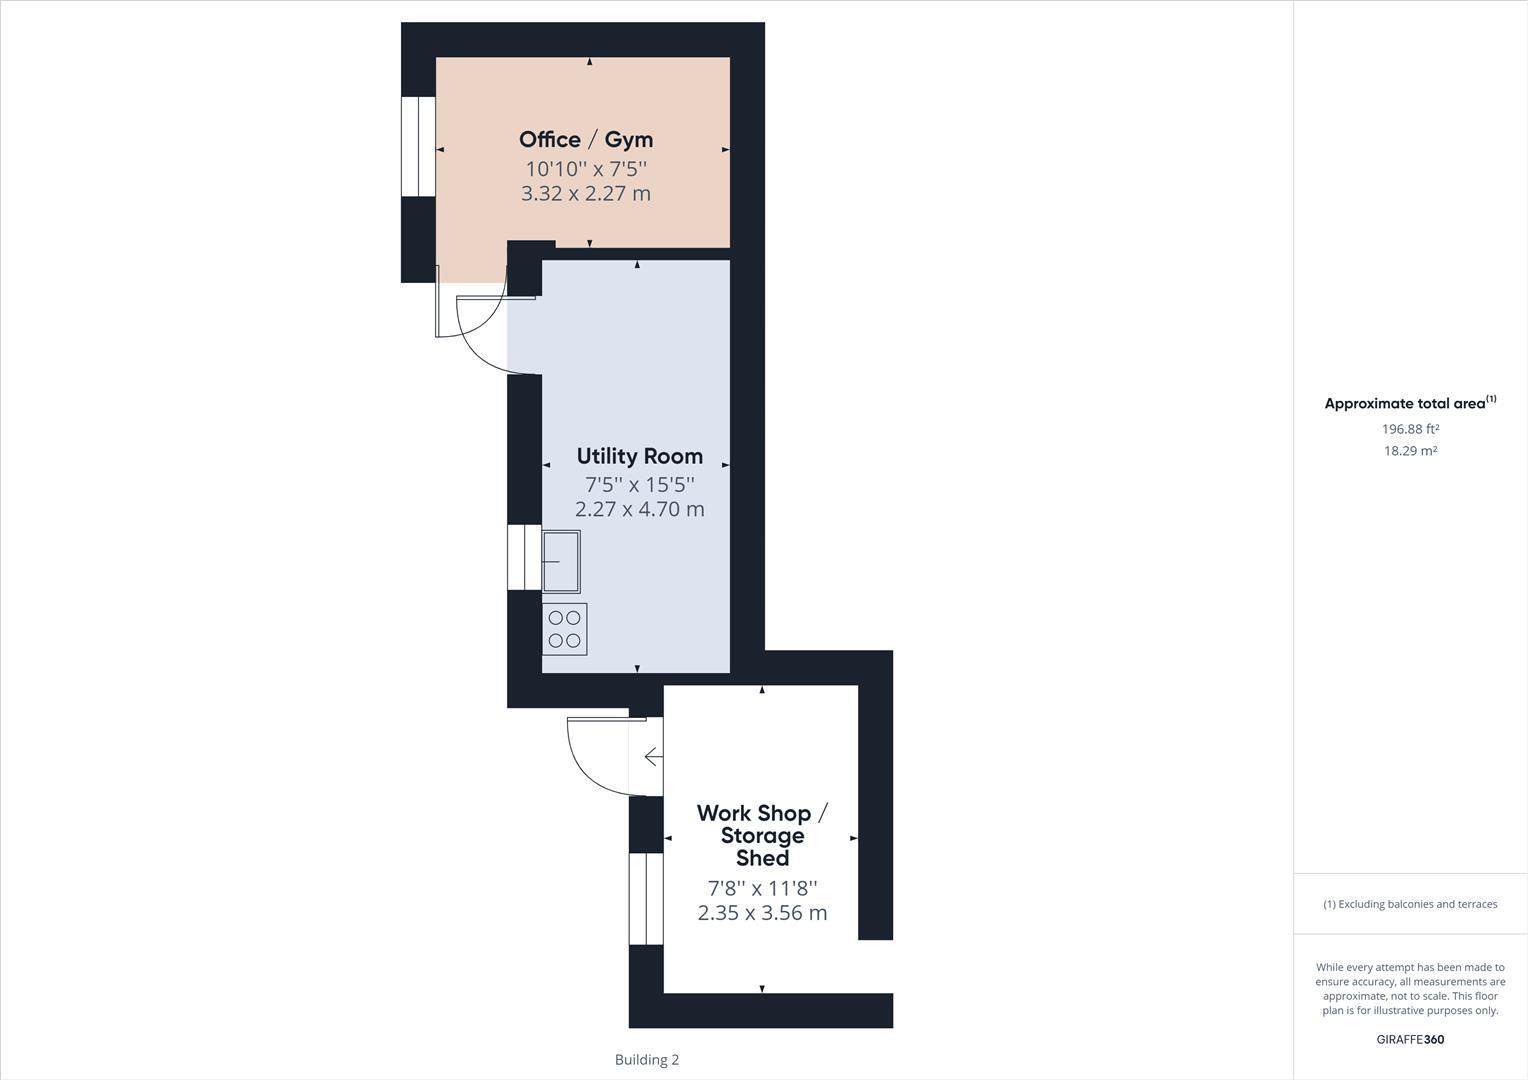 floorplan02_00.png